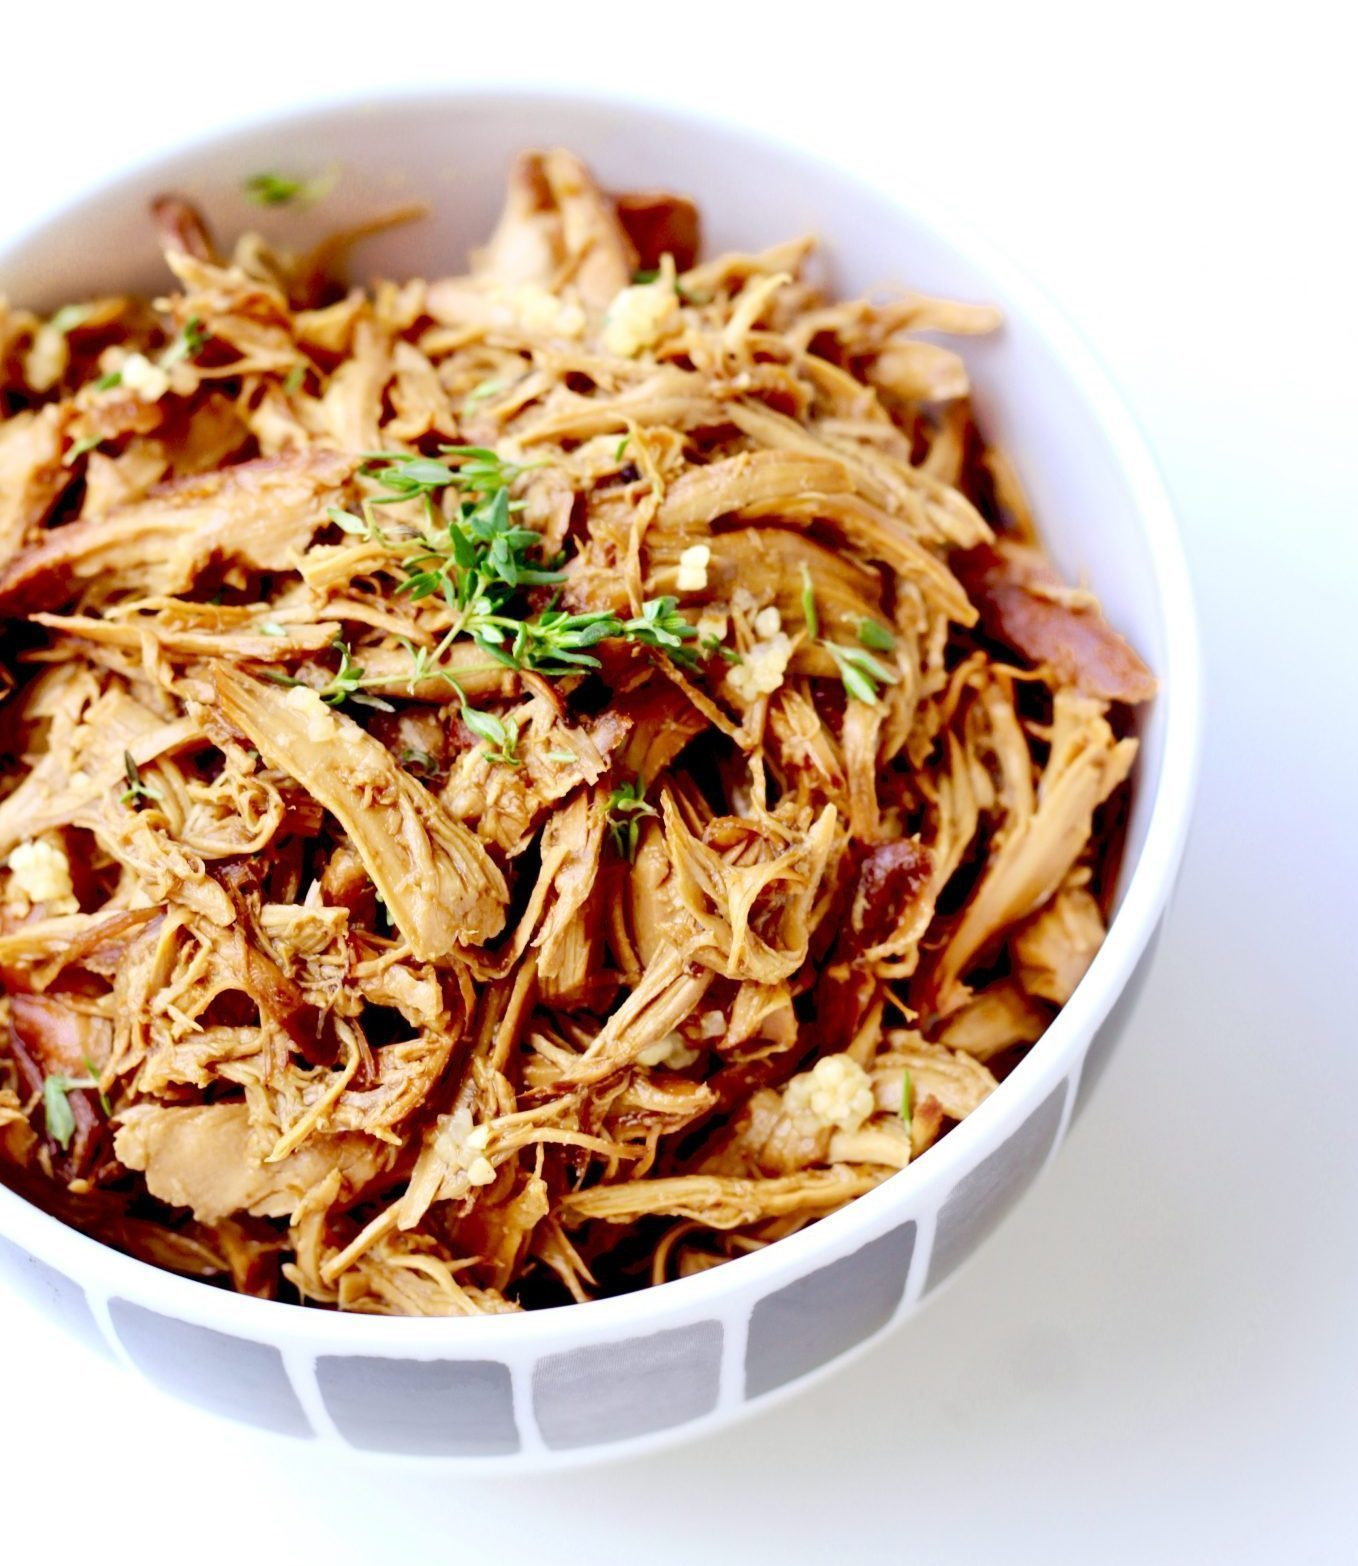 5 Ingredient Crock Pot Honey Garlic Chicken